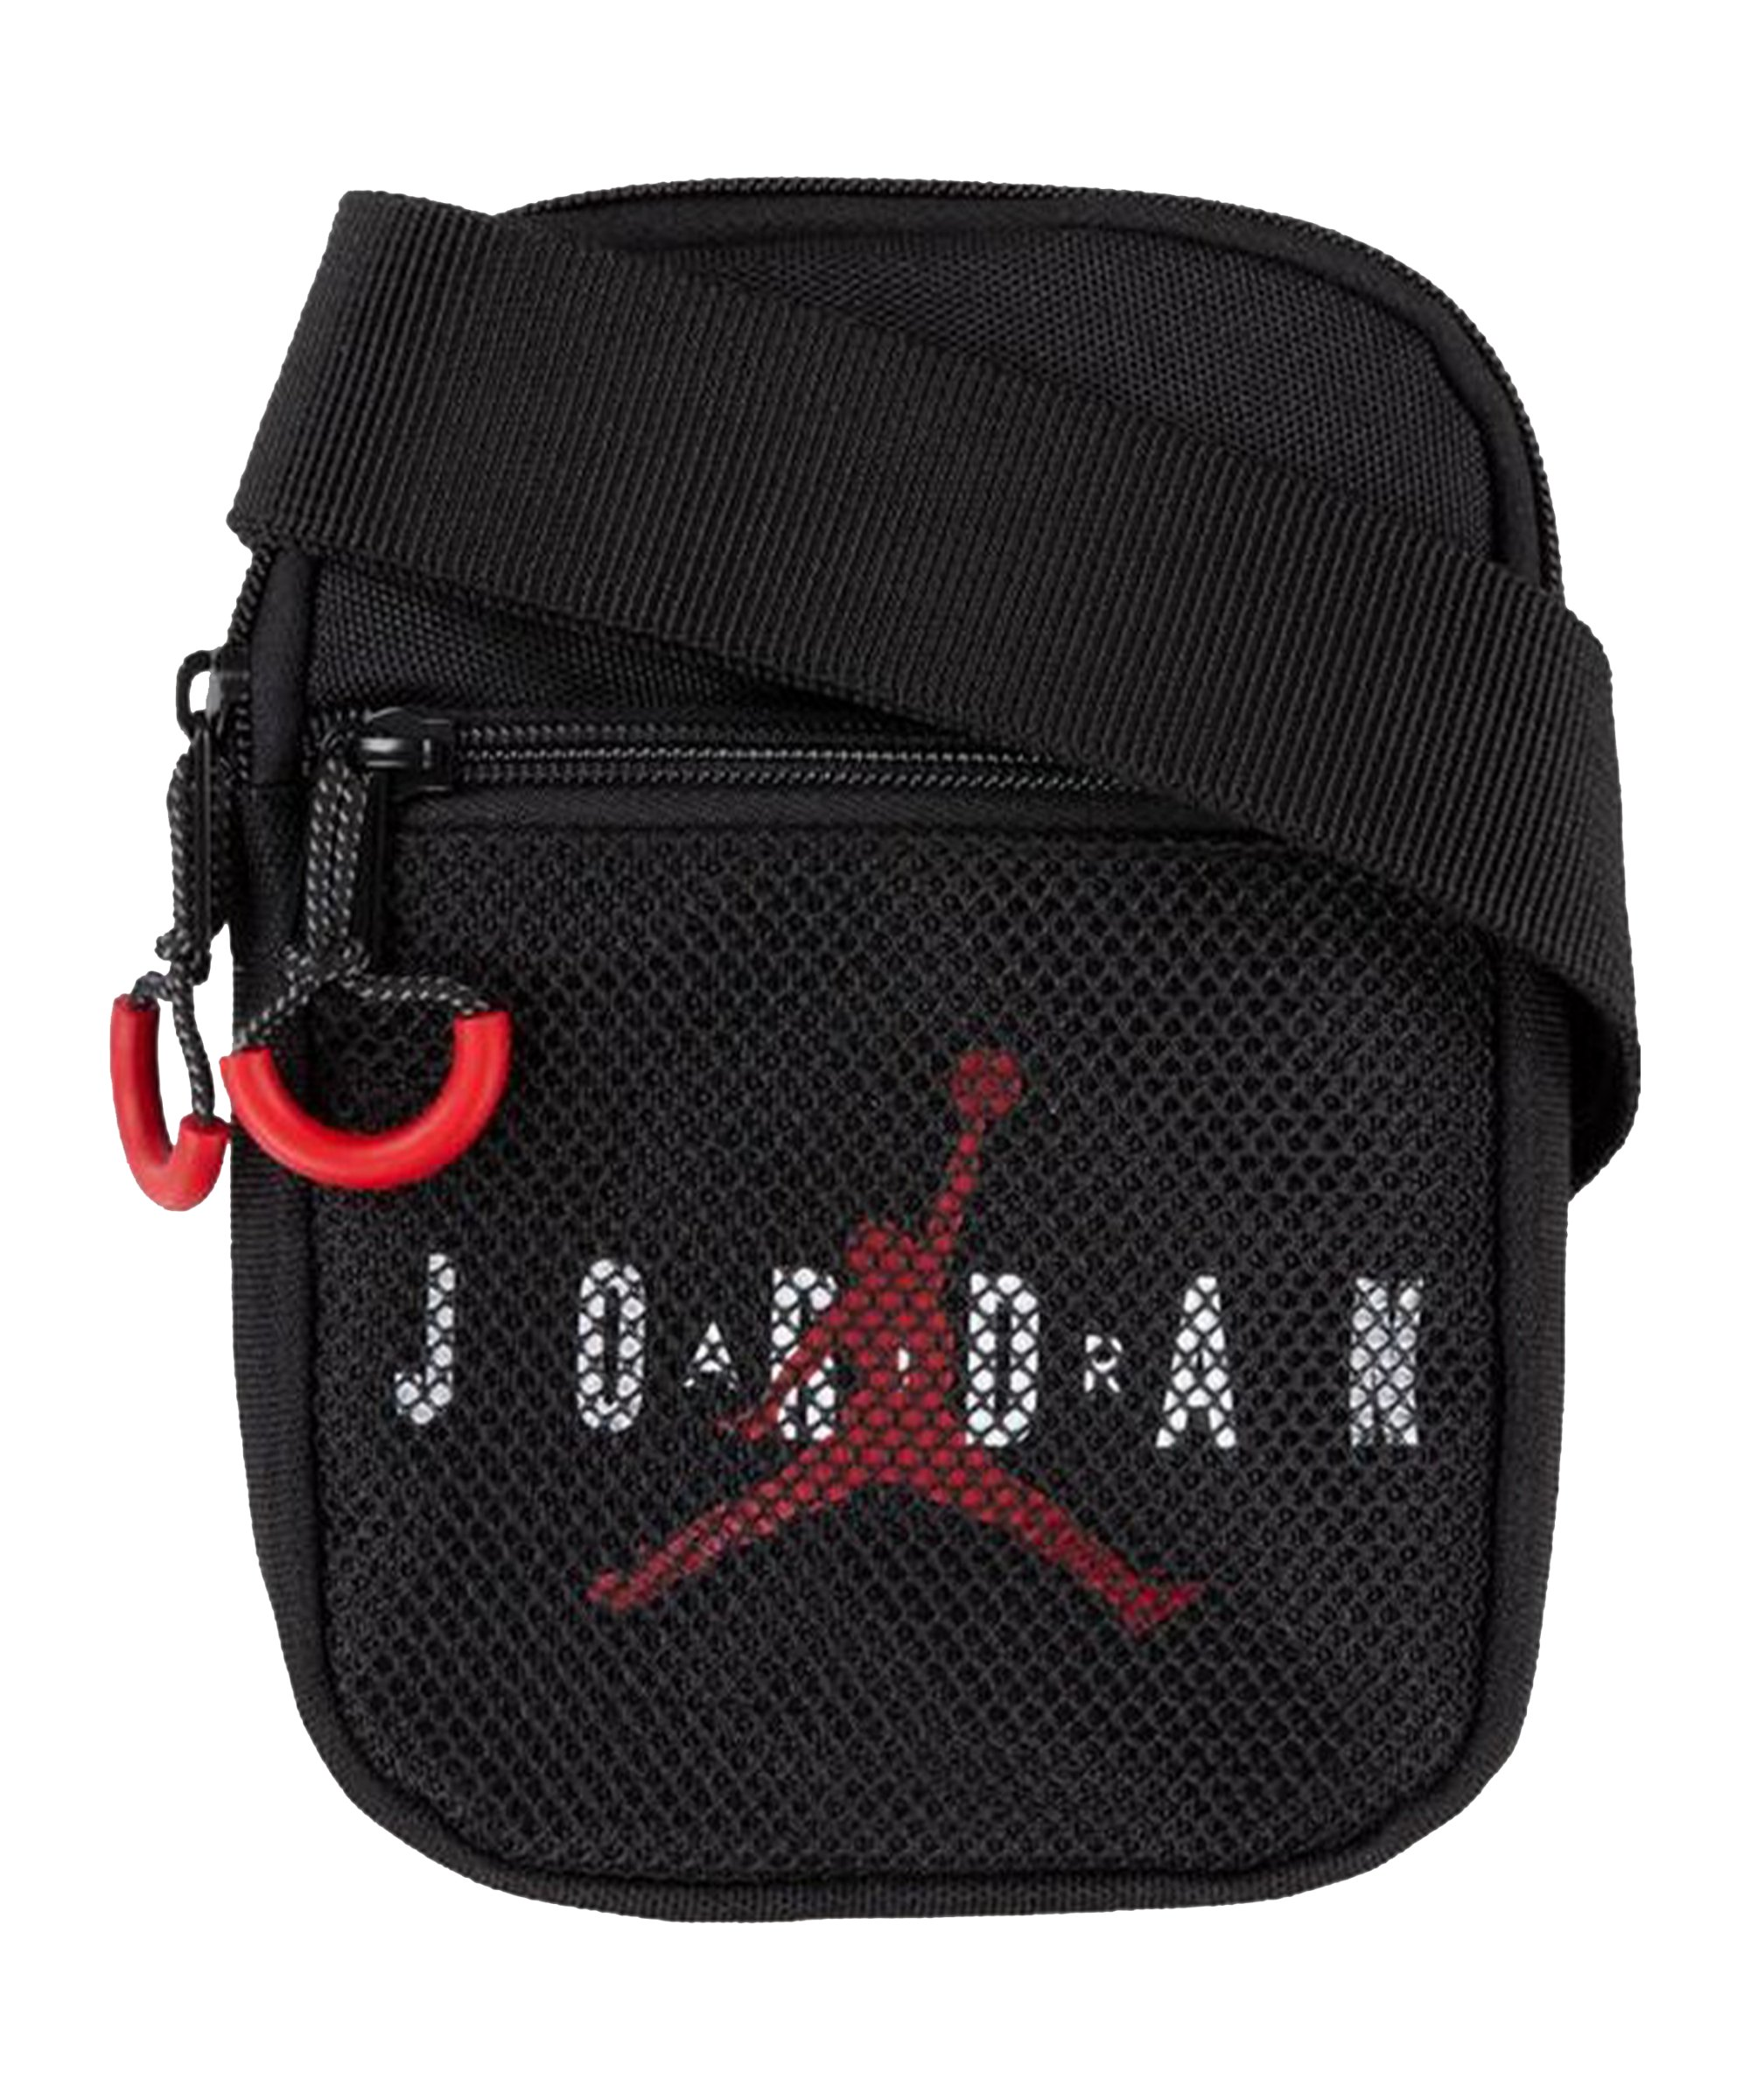 Jordan Air Festival Crossbody Bag Schwarz F023 - schwarz